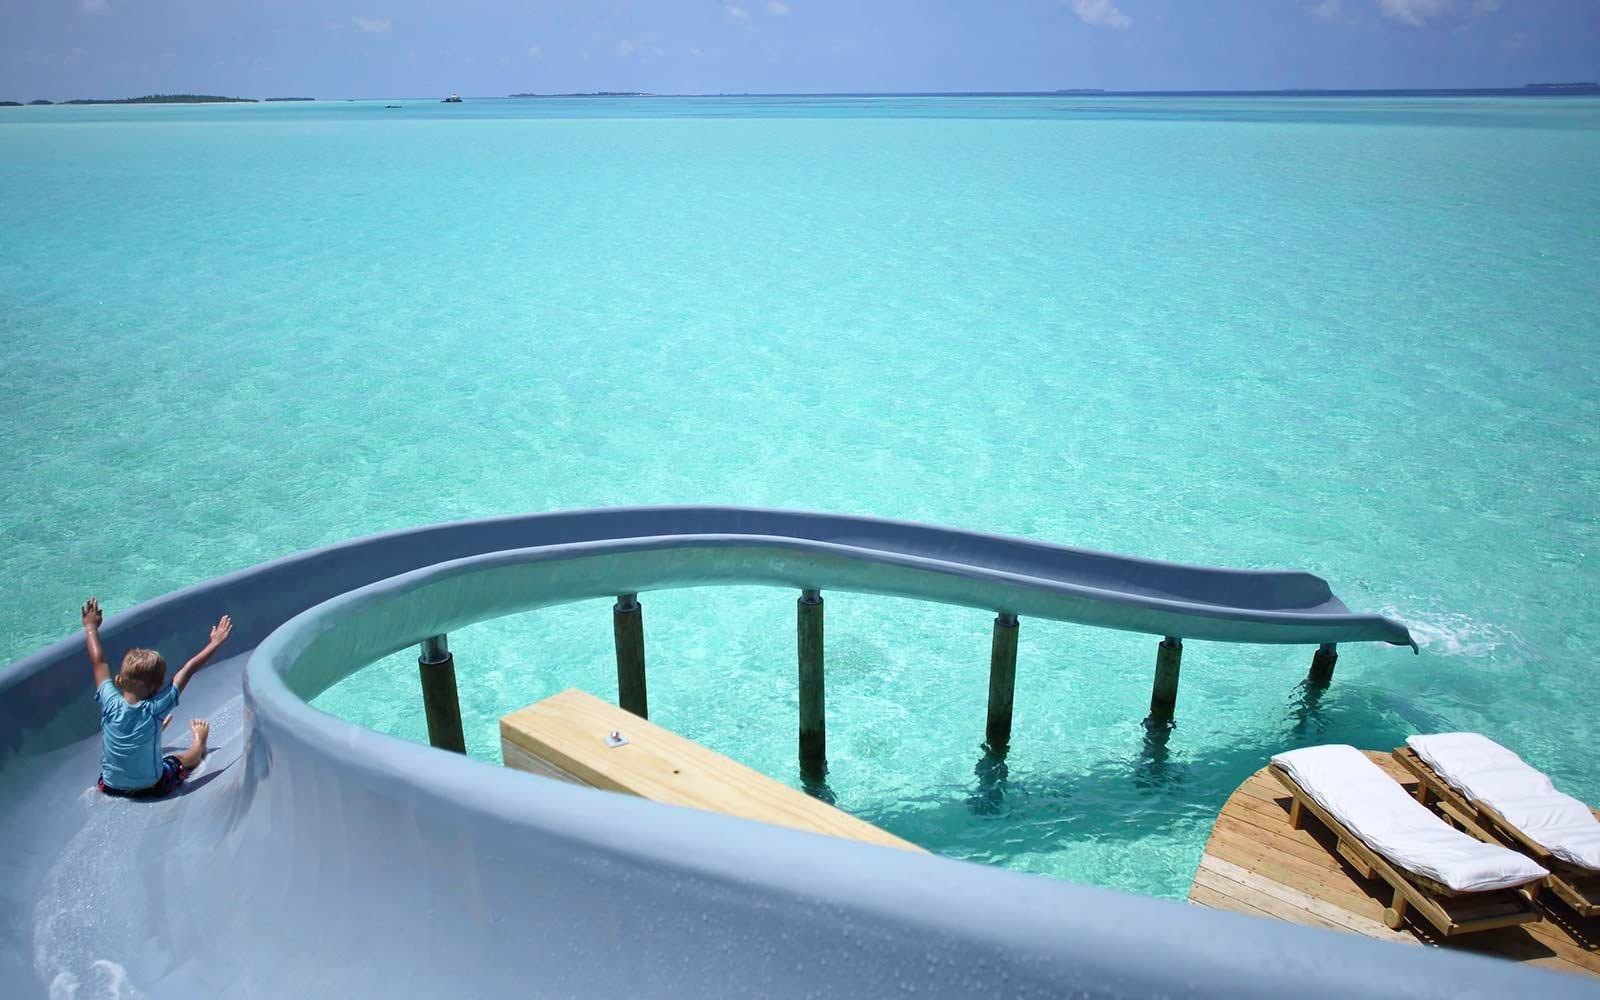 waterslide-soneva-jani-maldives-WATERSLIDE0217.jpg